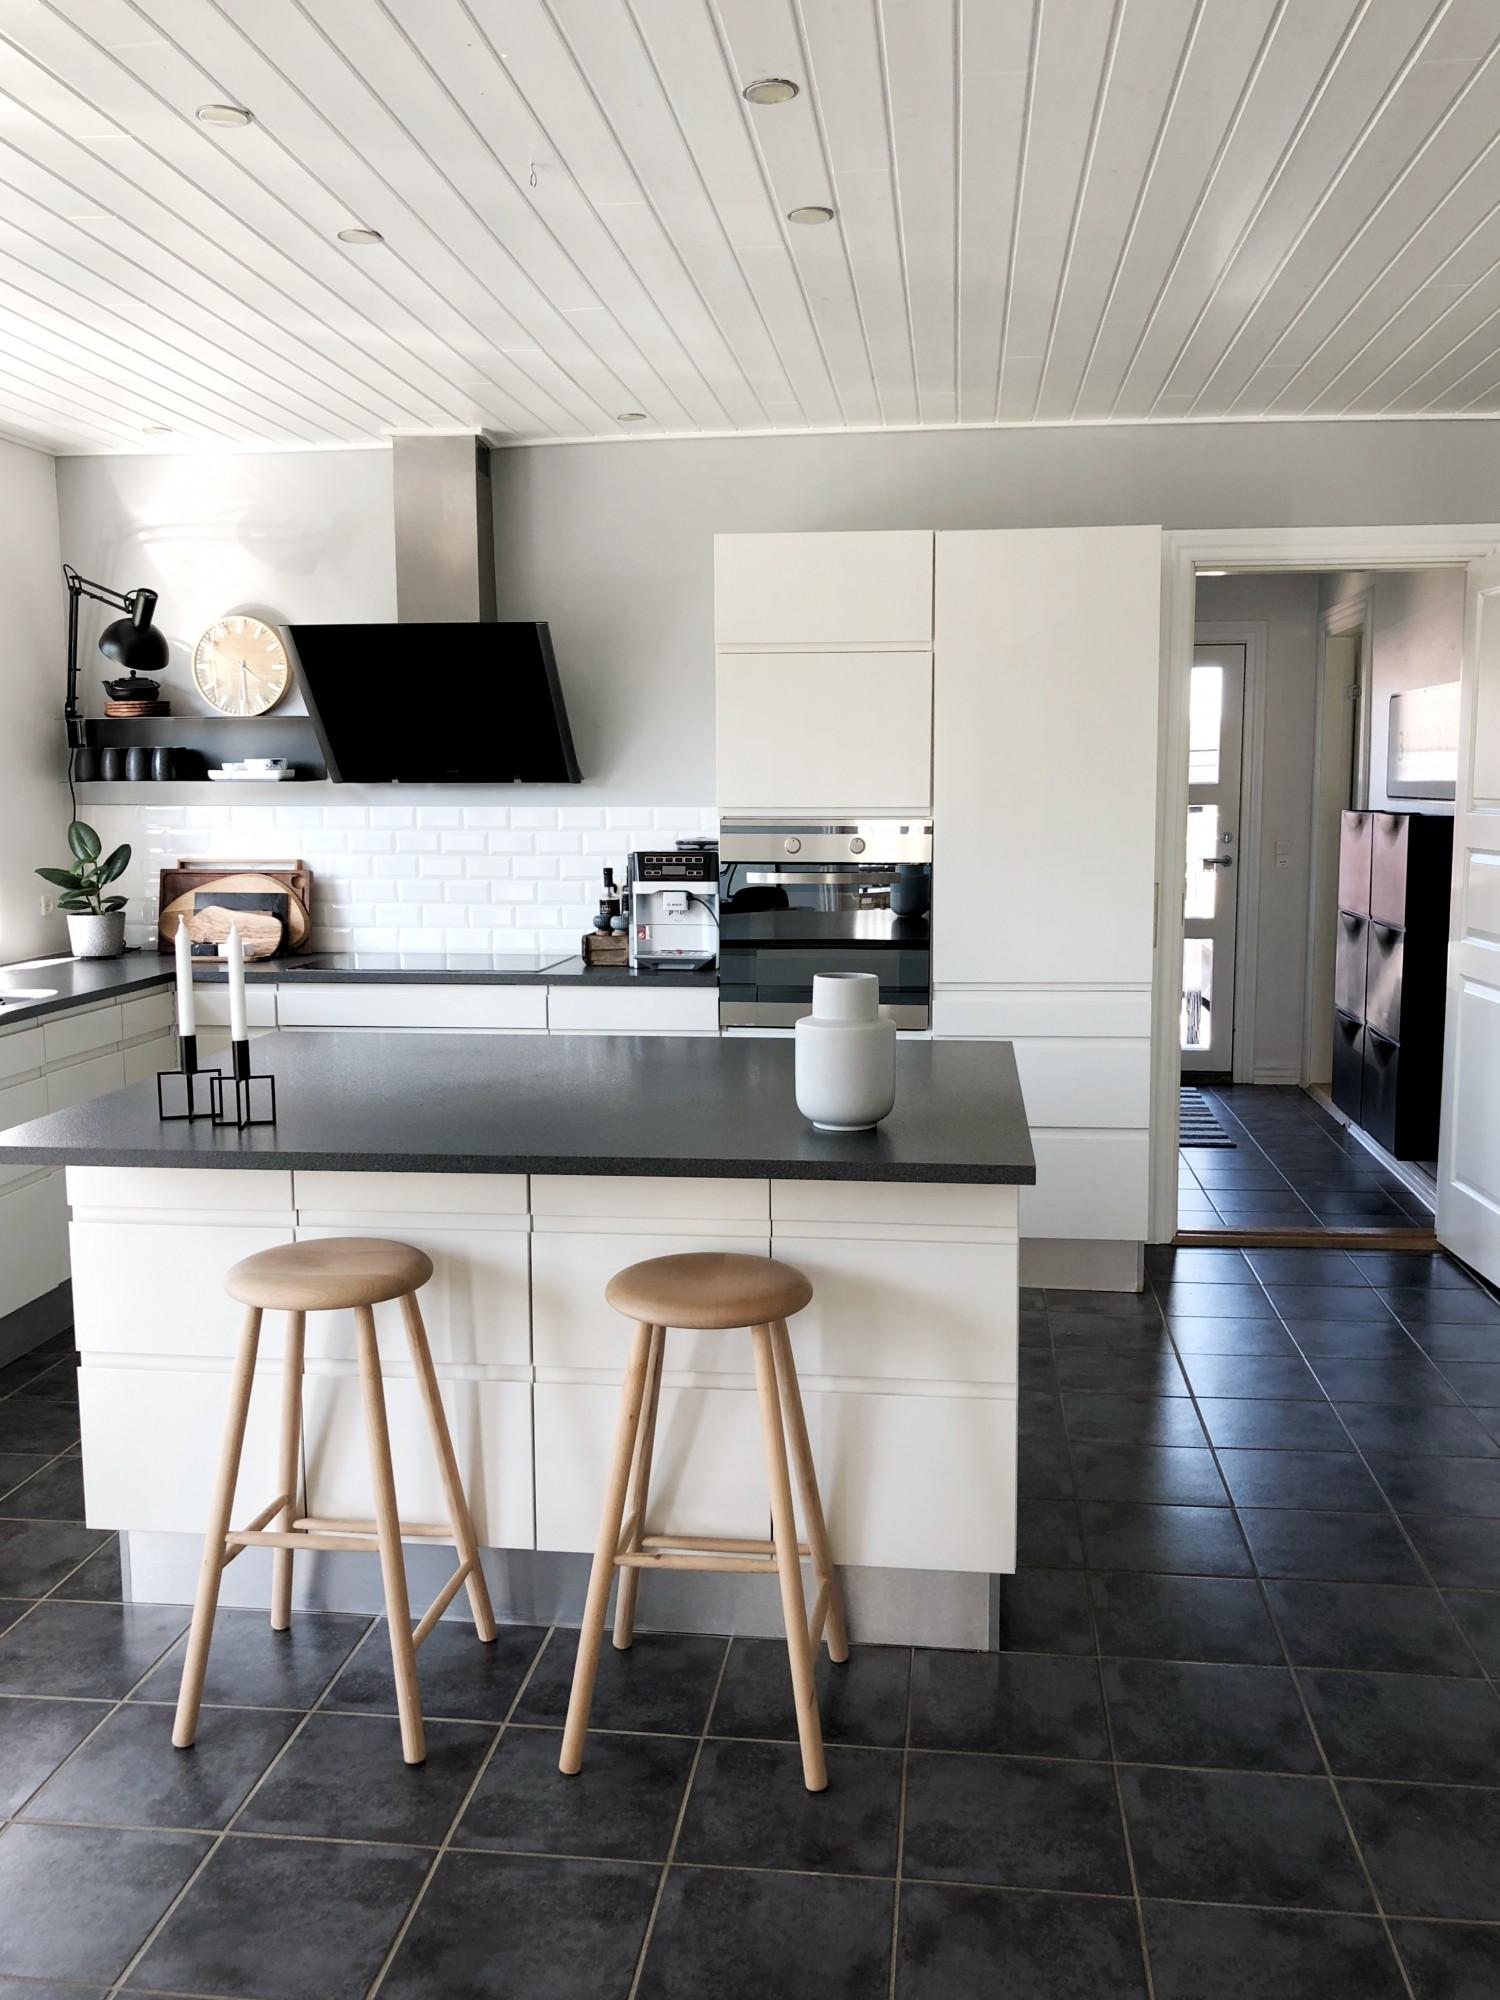 Ny farve i køkkenet